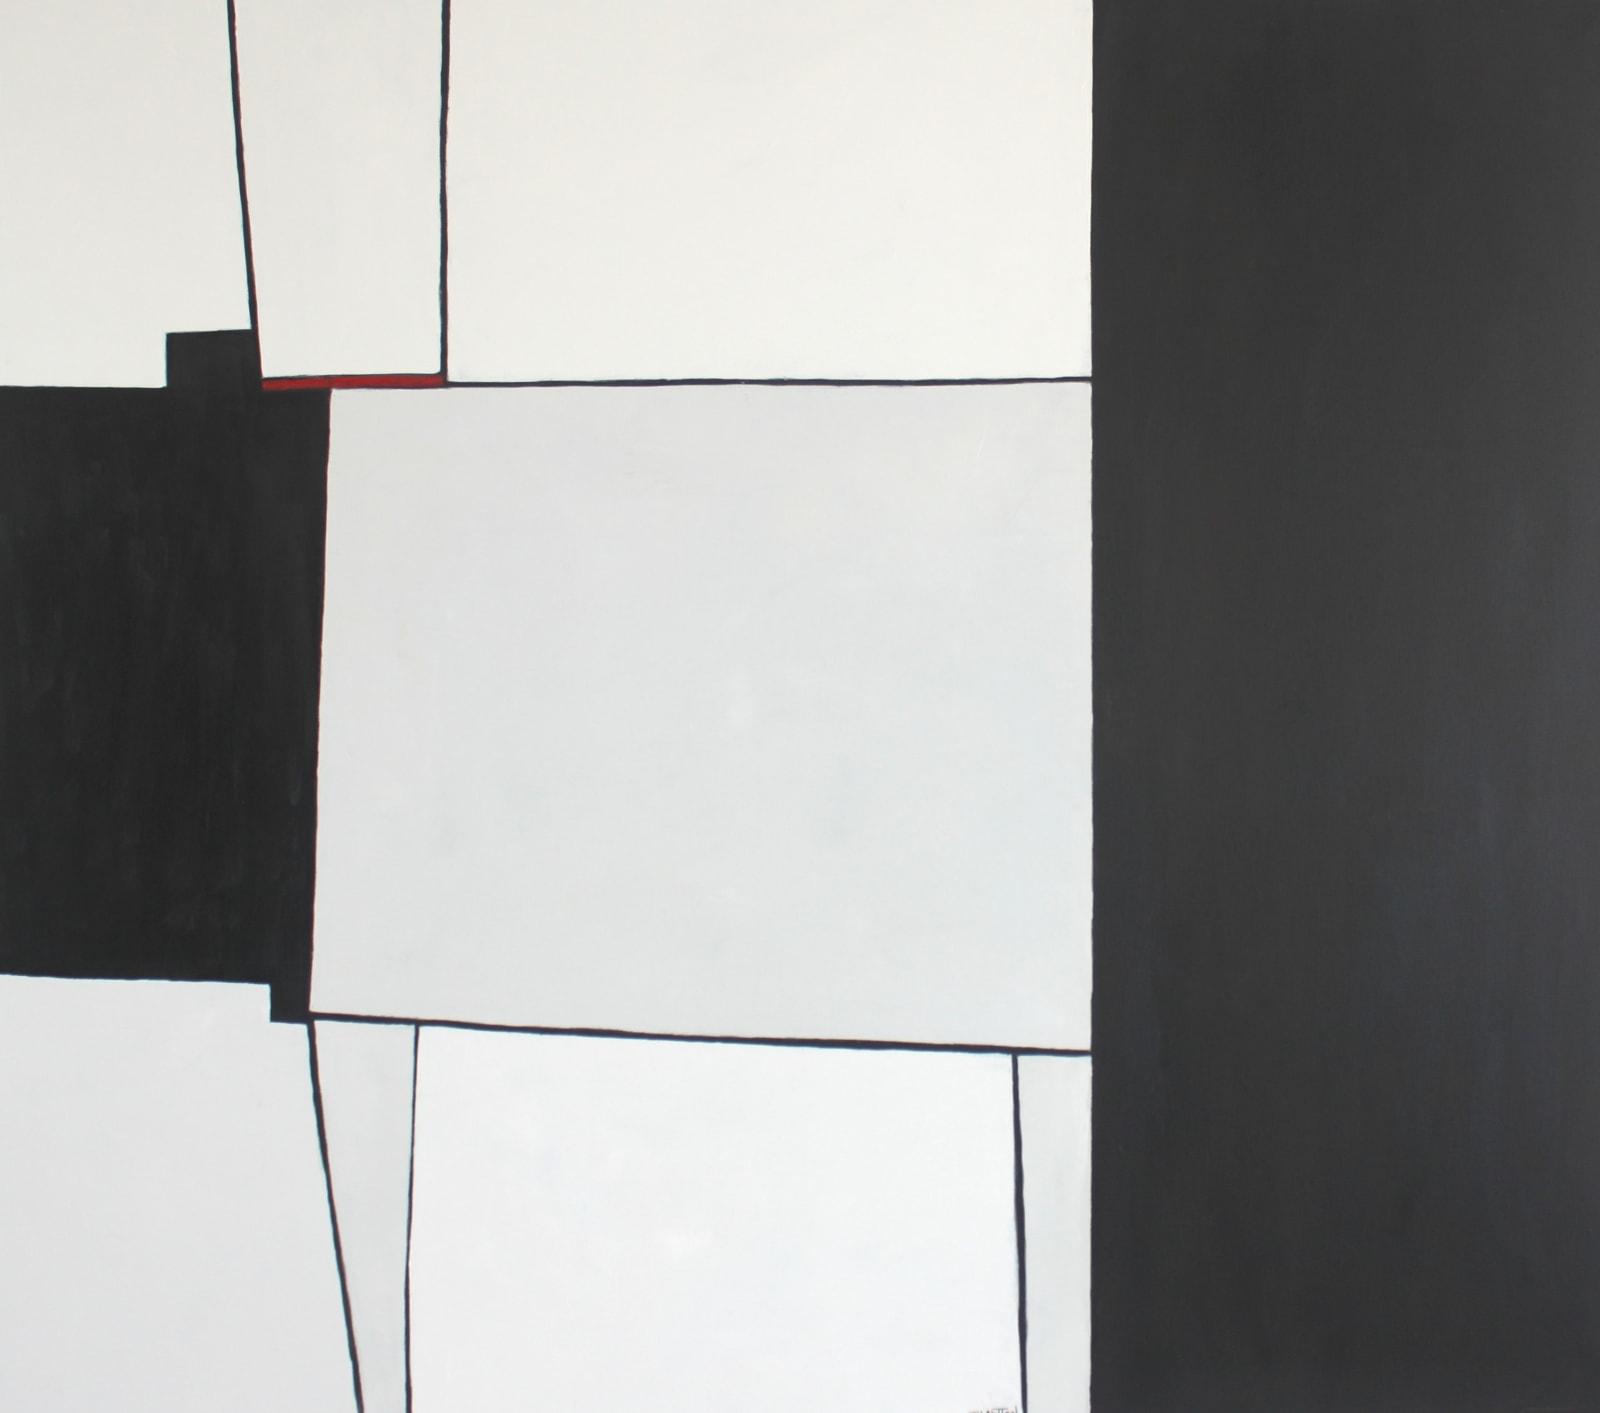 Teresa Lawton, Red Tread, 2018